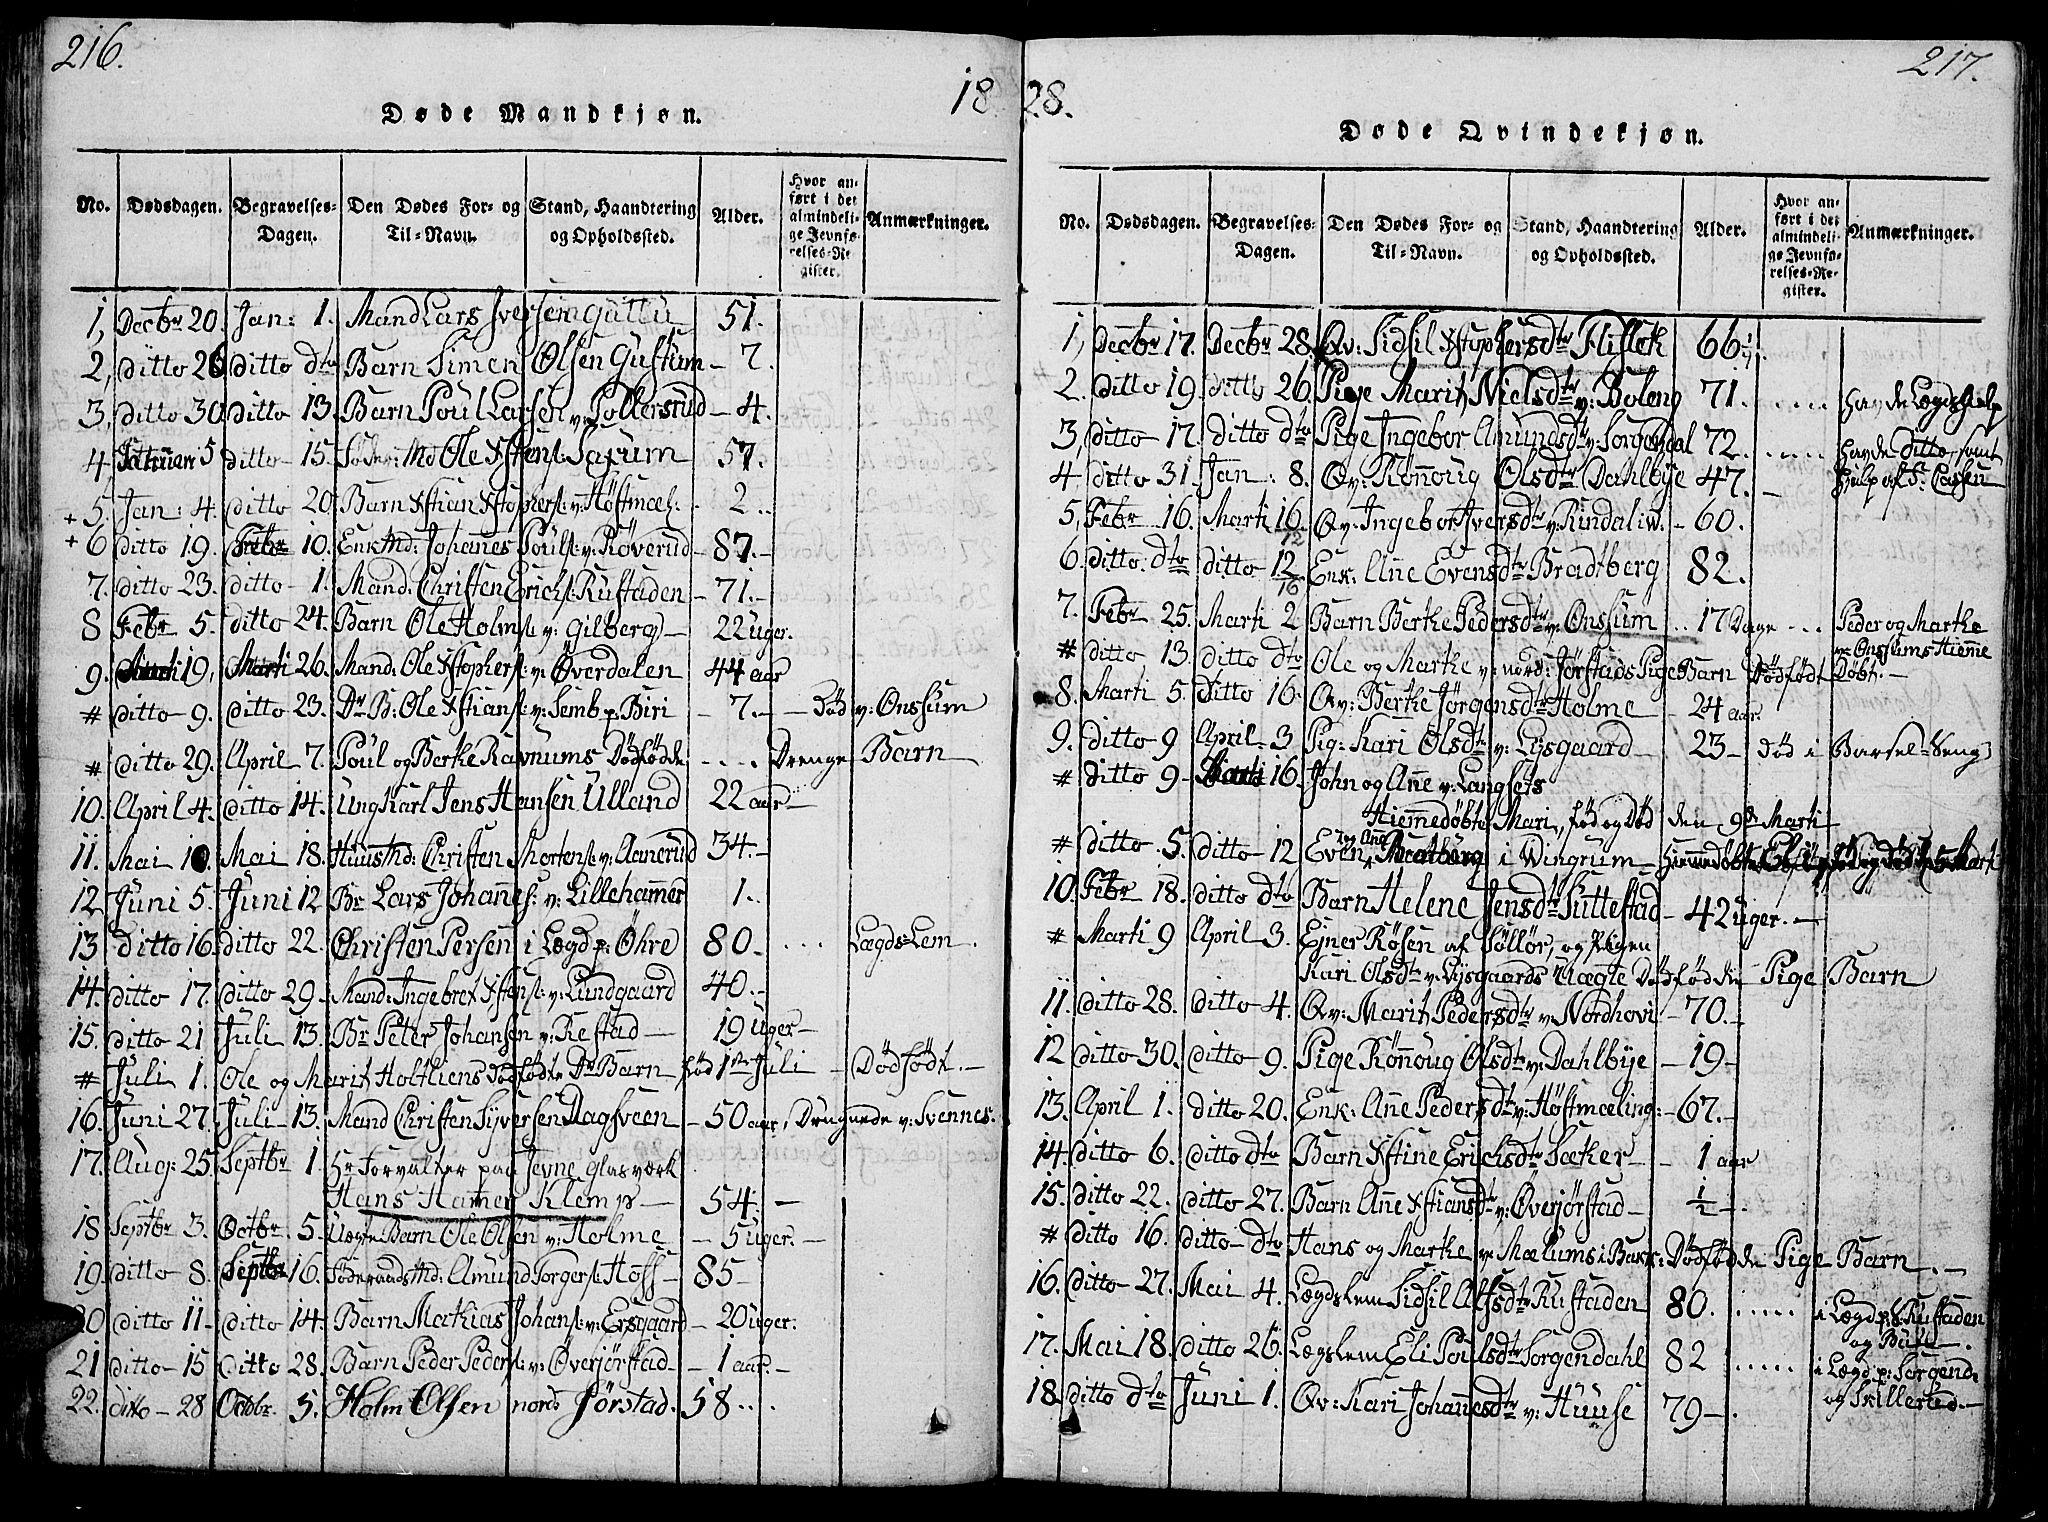 SAH, Fåberg prestekontor, Klokkerbok nr. 4, 1818-1837, s. 216-217